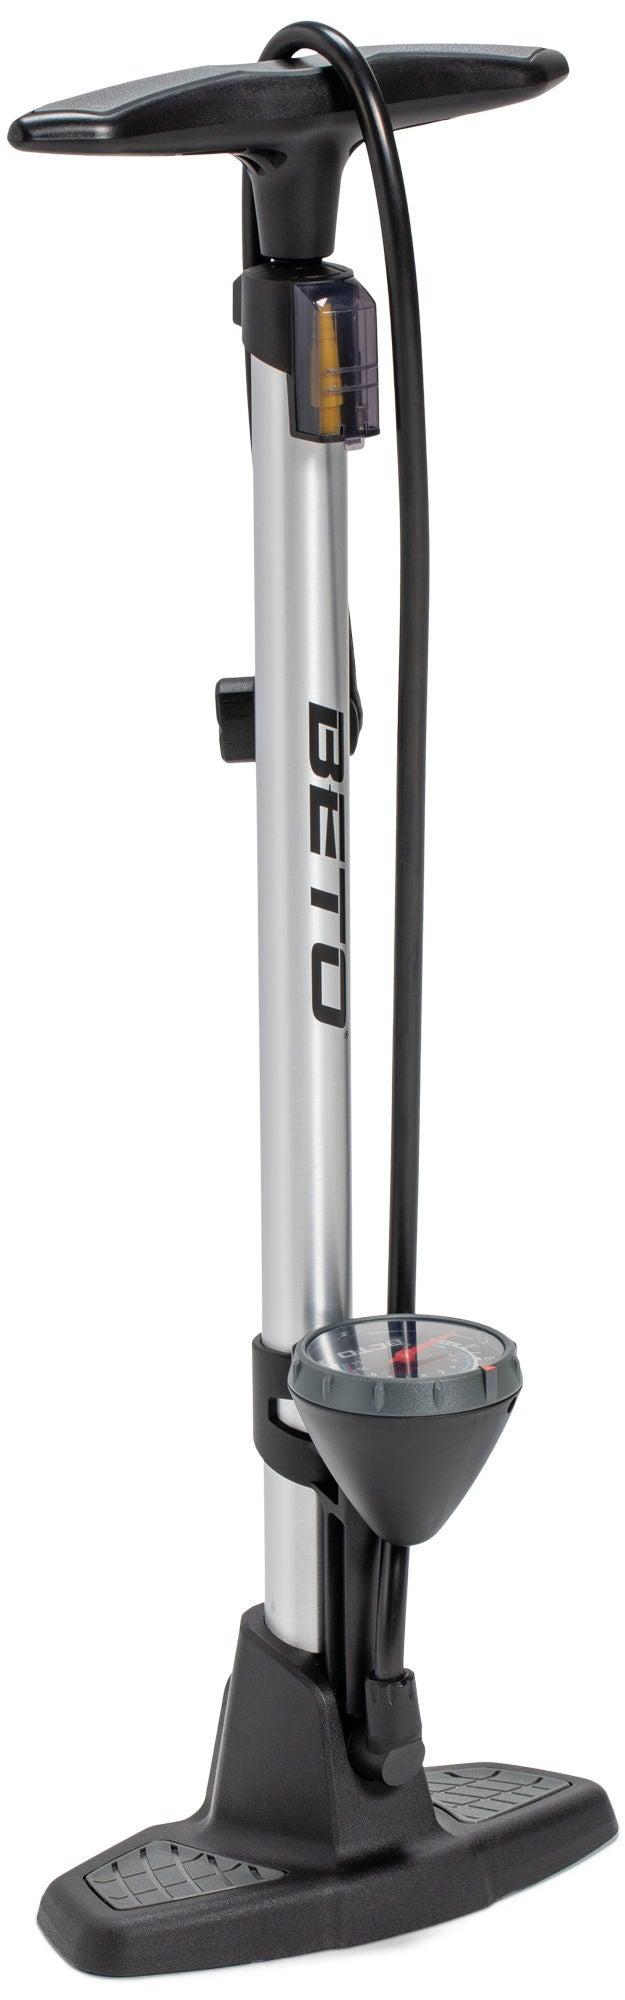 Beto Cykelpumpe 25 tommer | Manual pumps